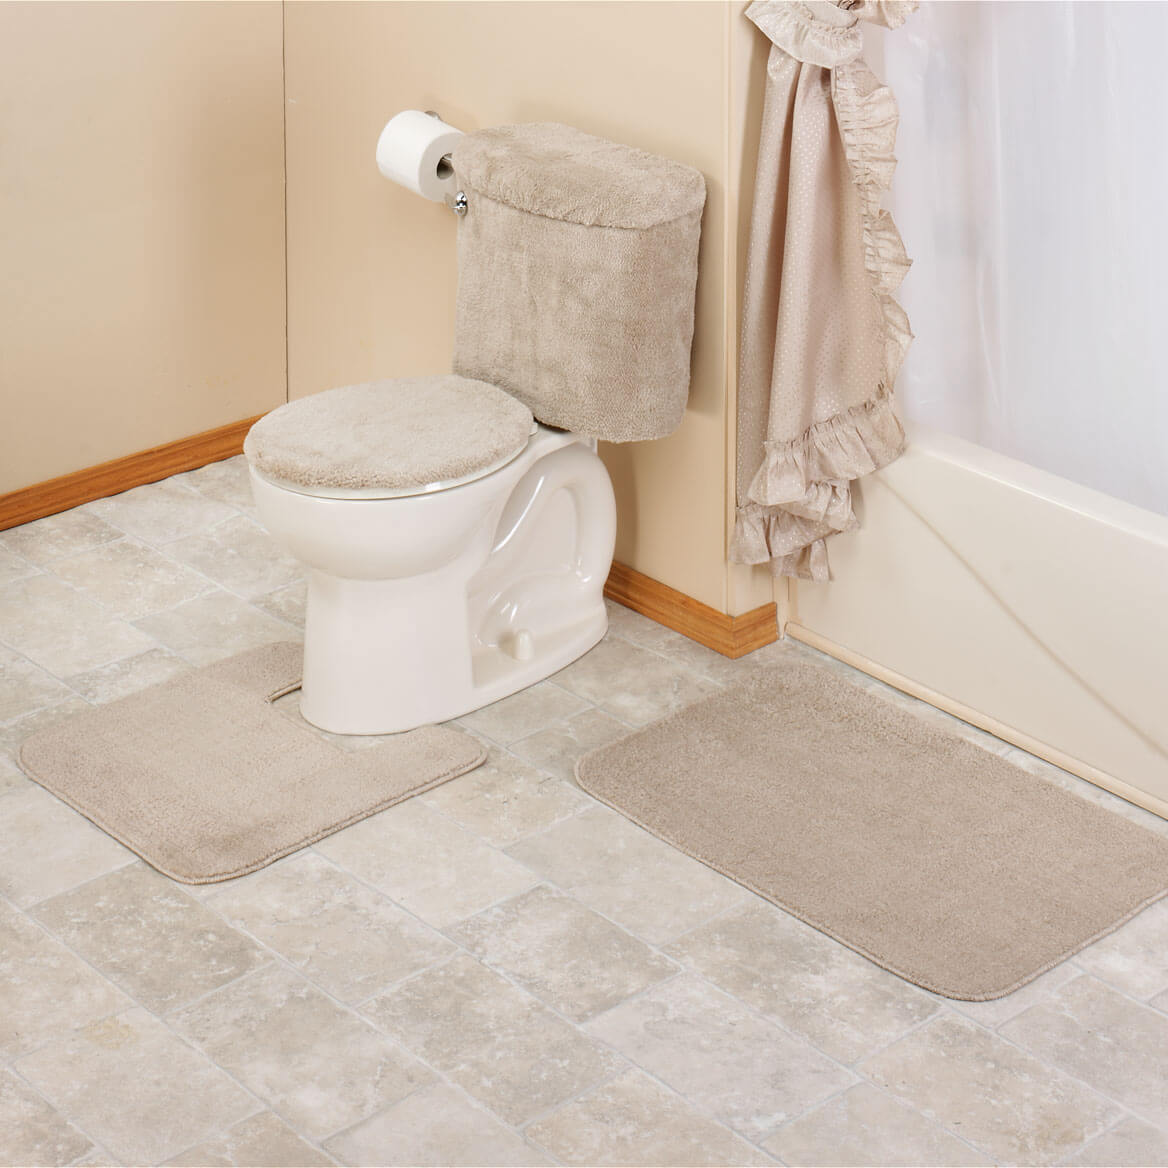 Piece Bath Rug Contour Lid Tank, 5 Piece Bathroom Rug Set